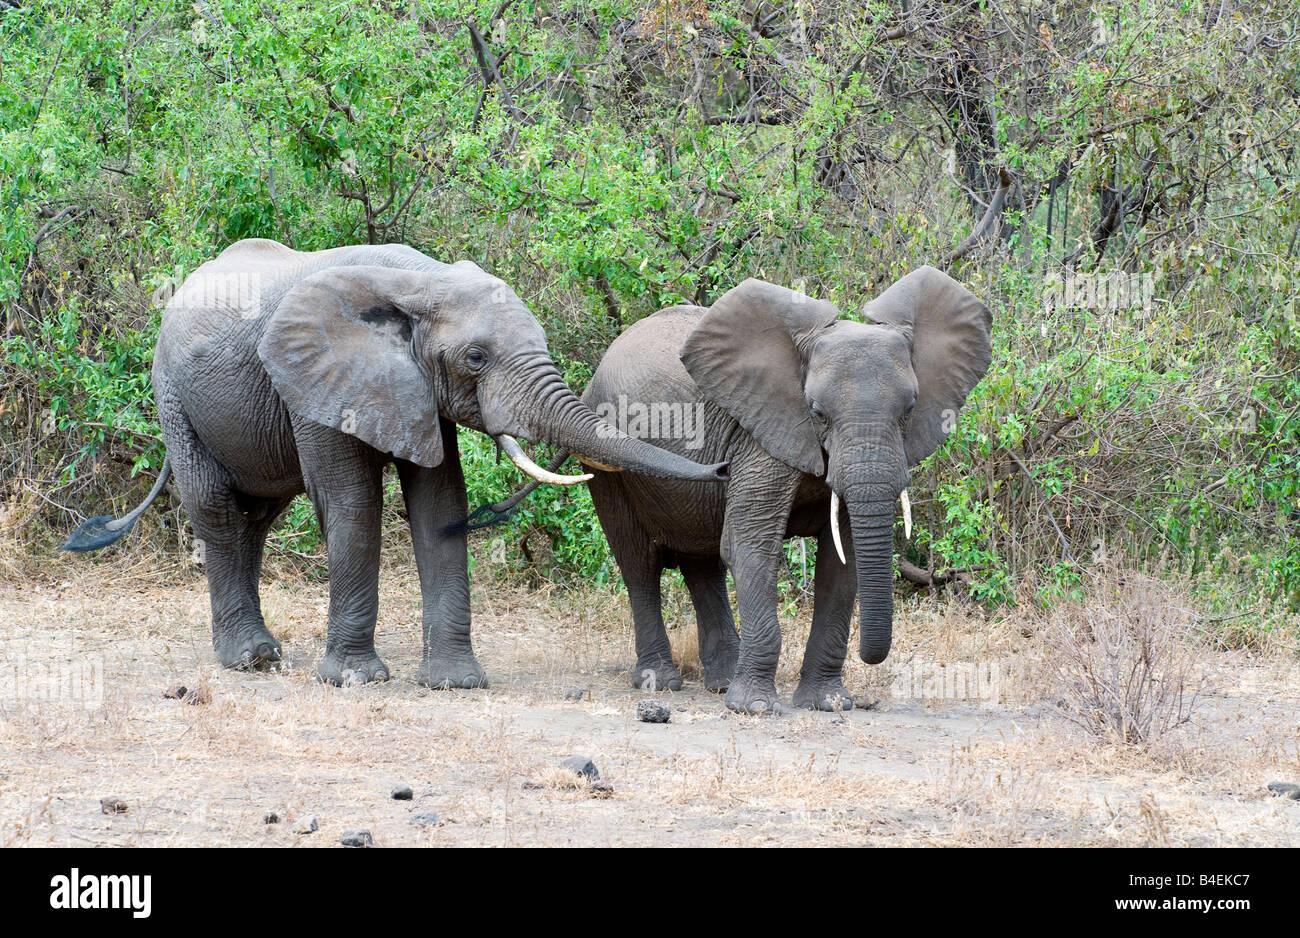 Tanzania Lake Manyara National Park elephants Loxodonta africana - Stock Image